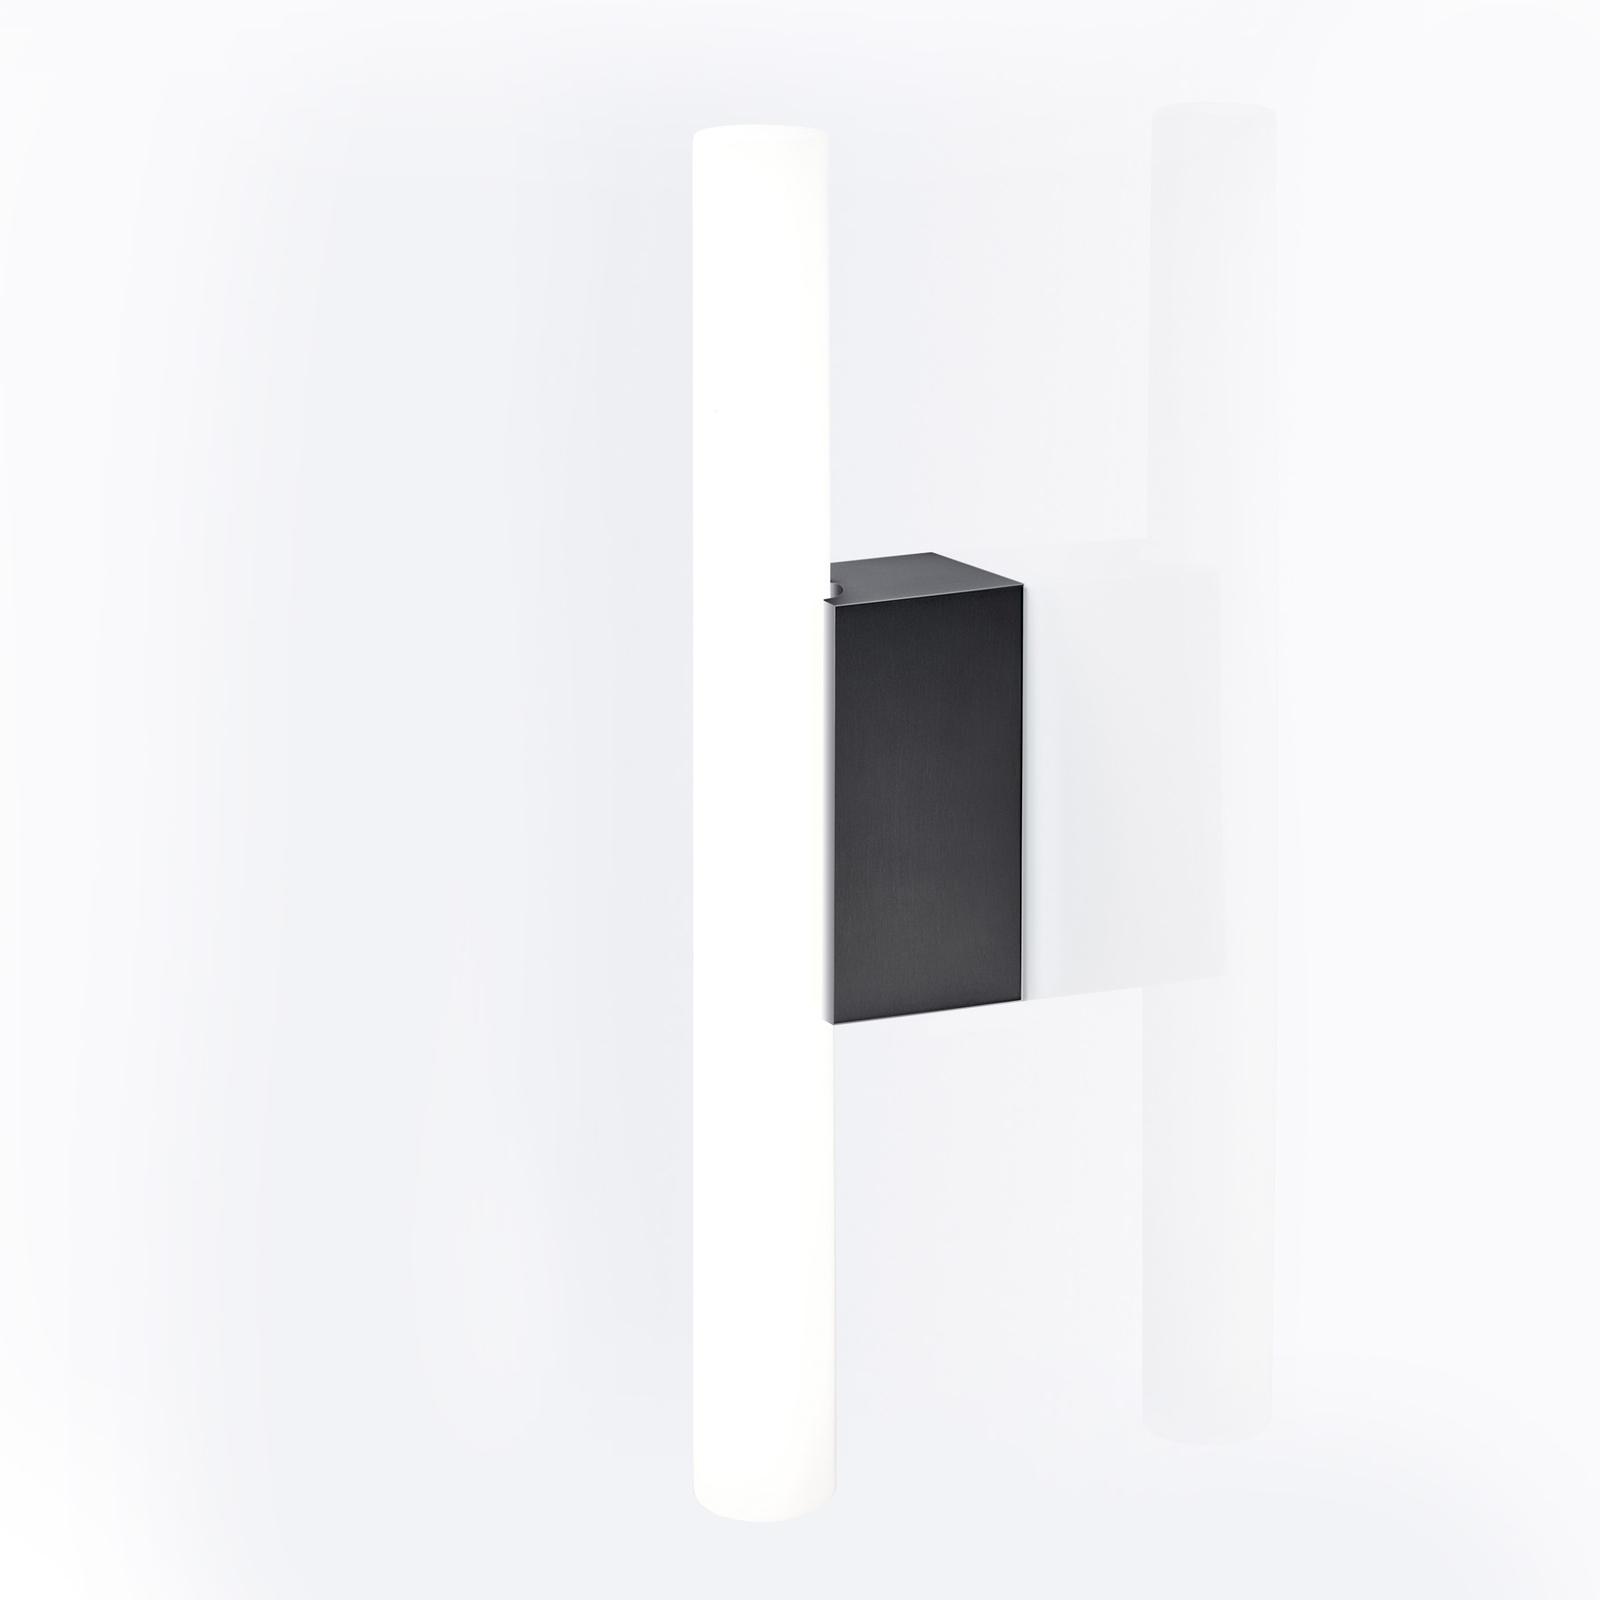 Decor Walther Omega 2 lampa ścienna czarna